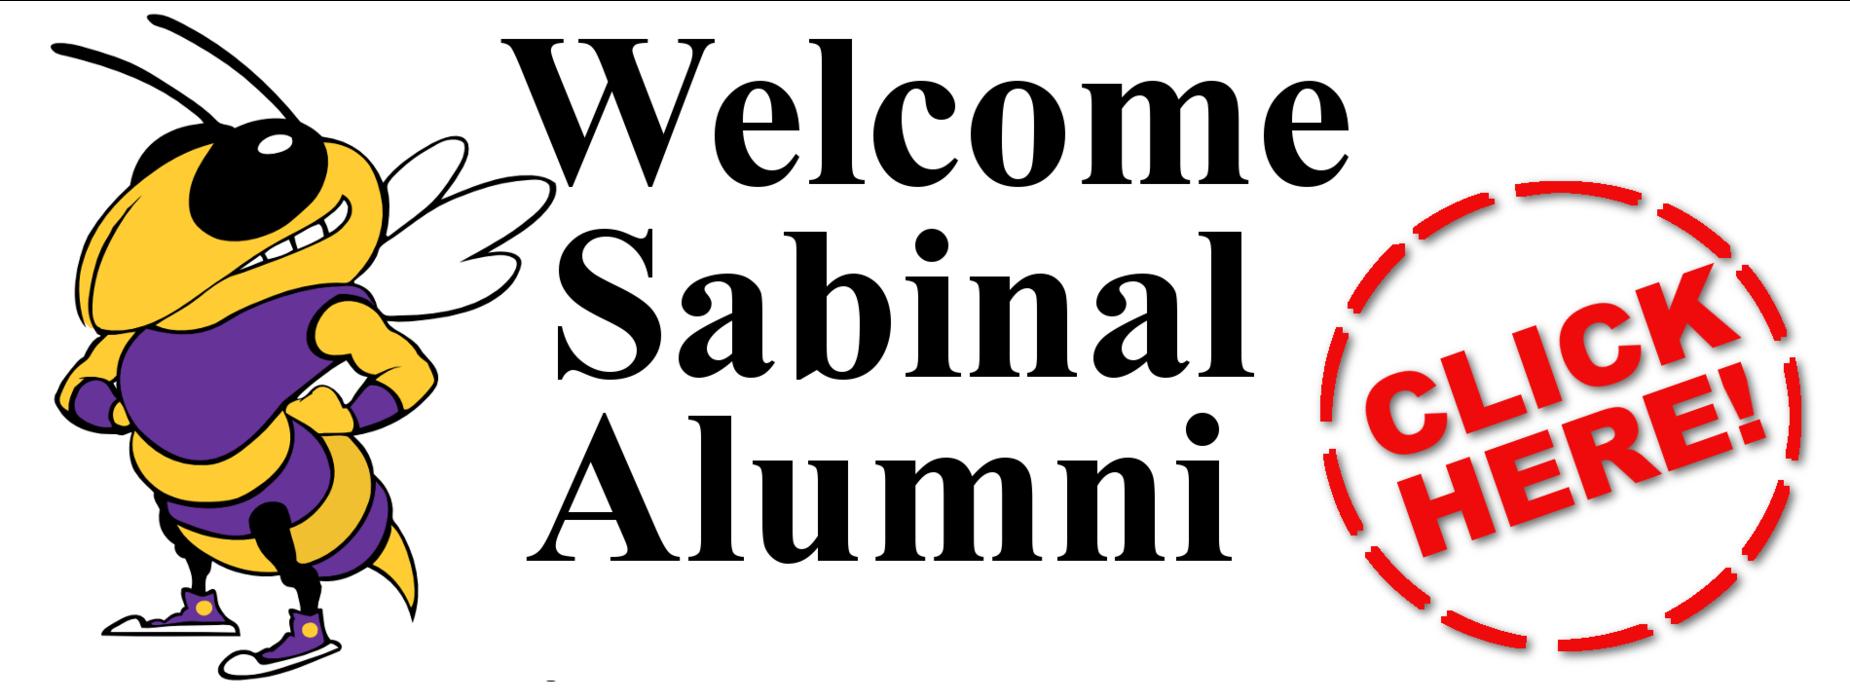 Welcome Sabinal Alumni - Click Here!